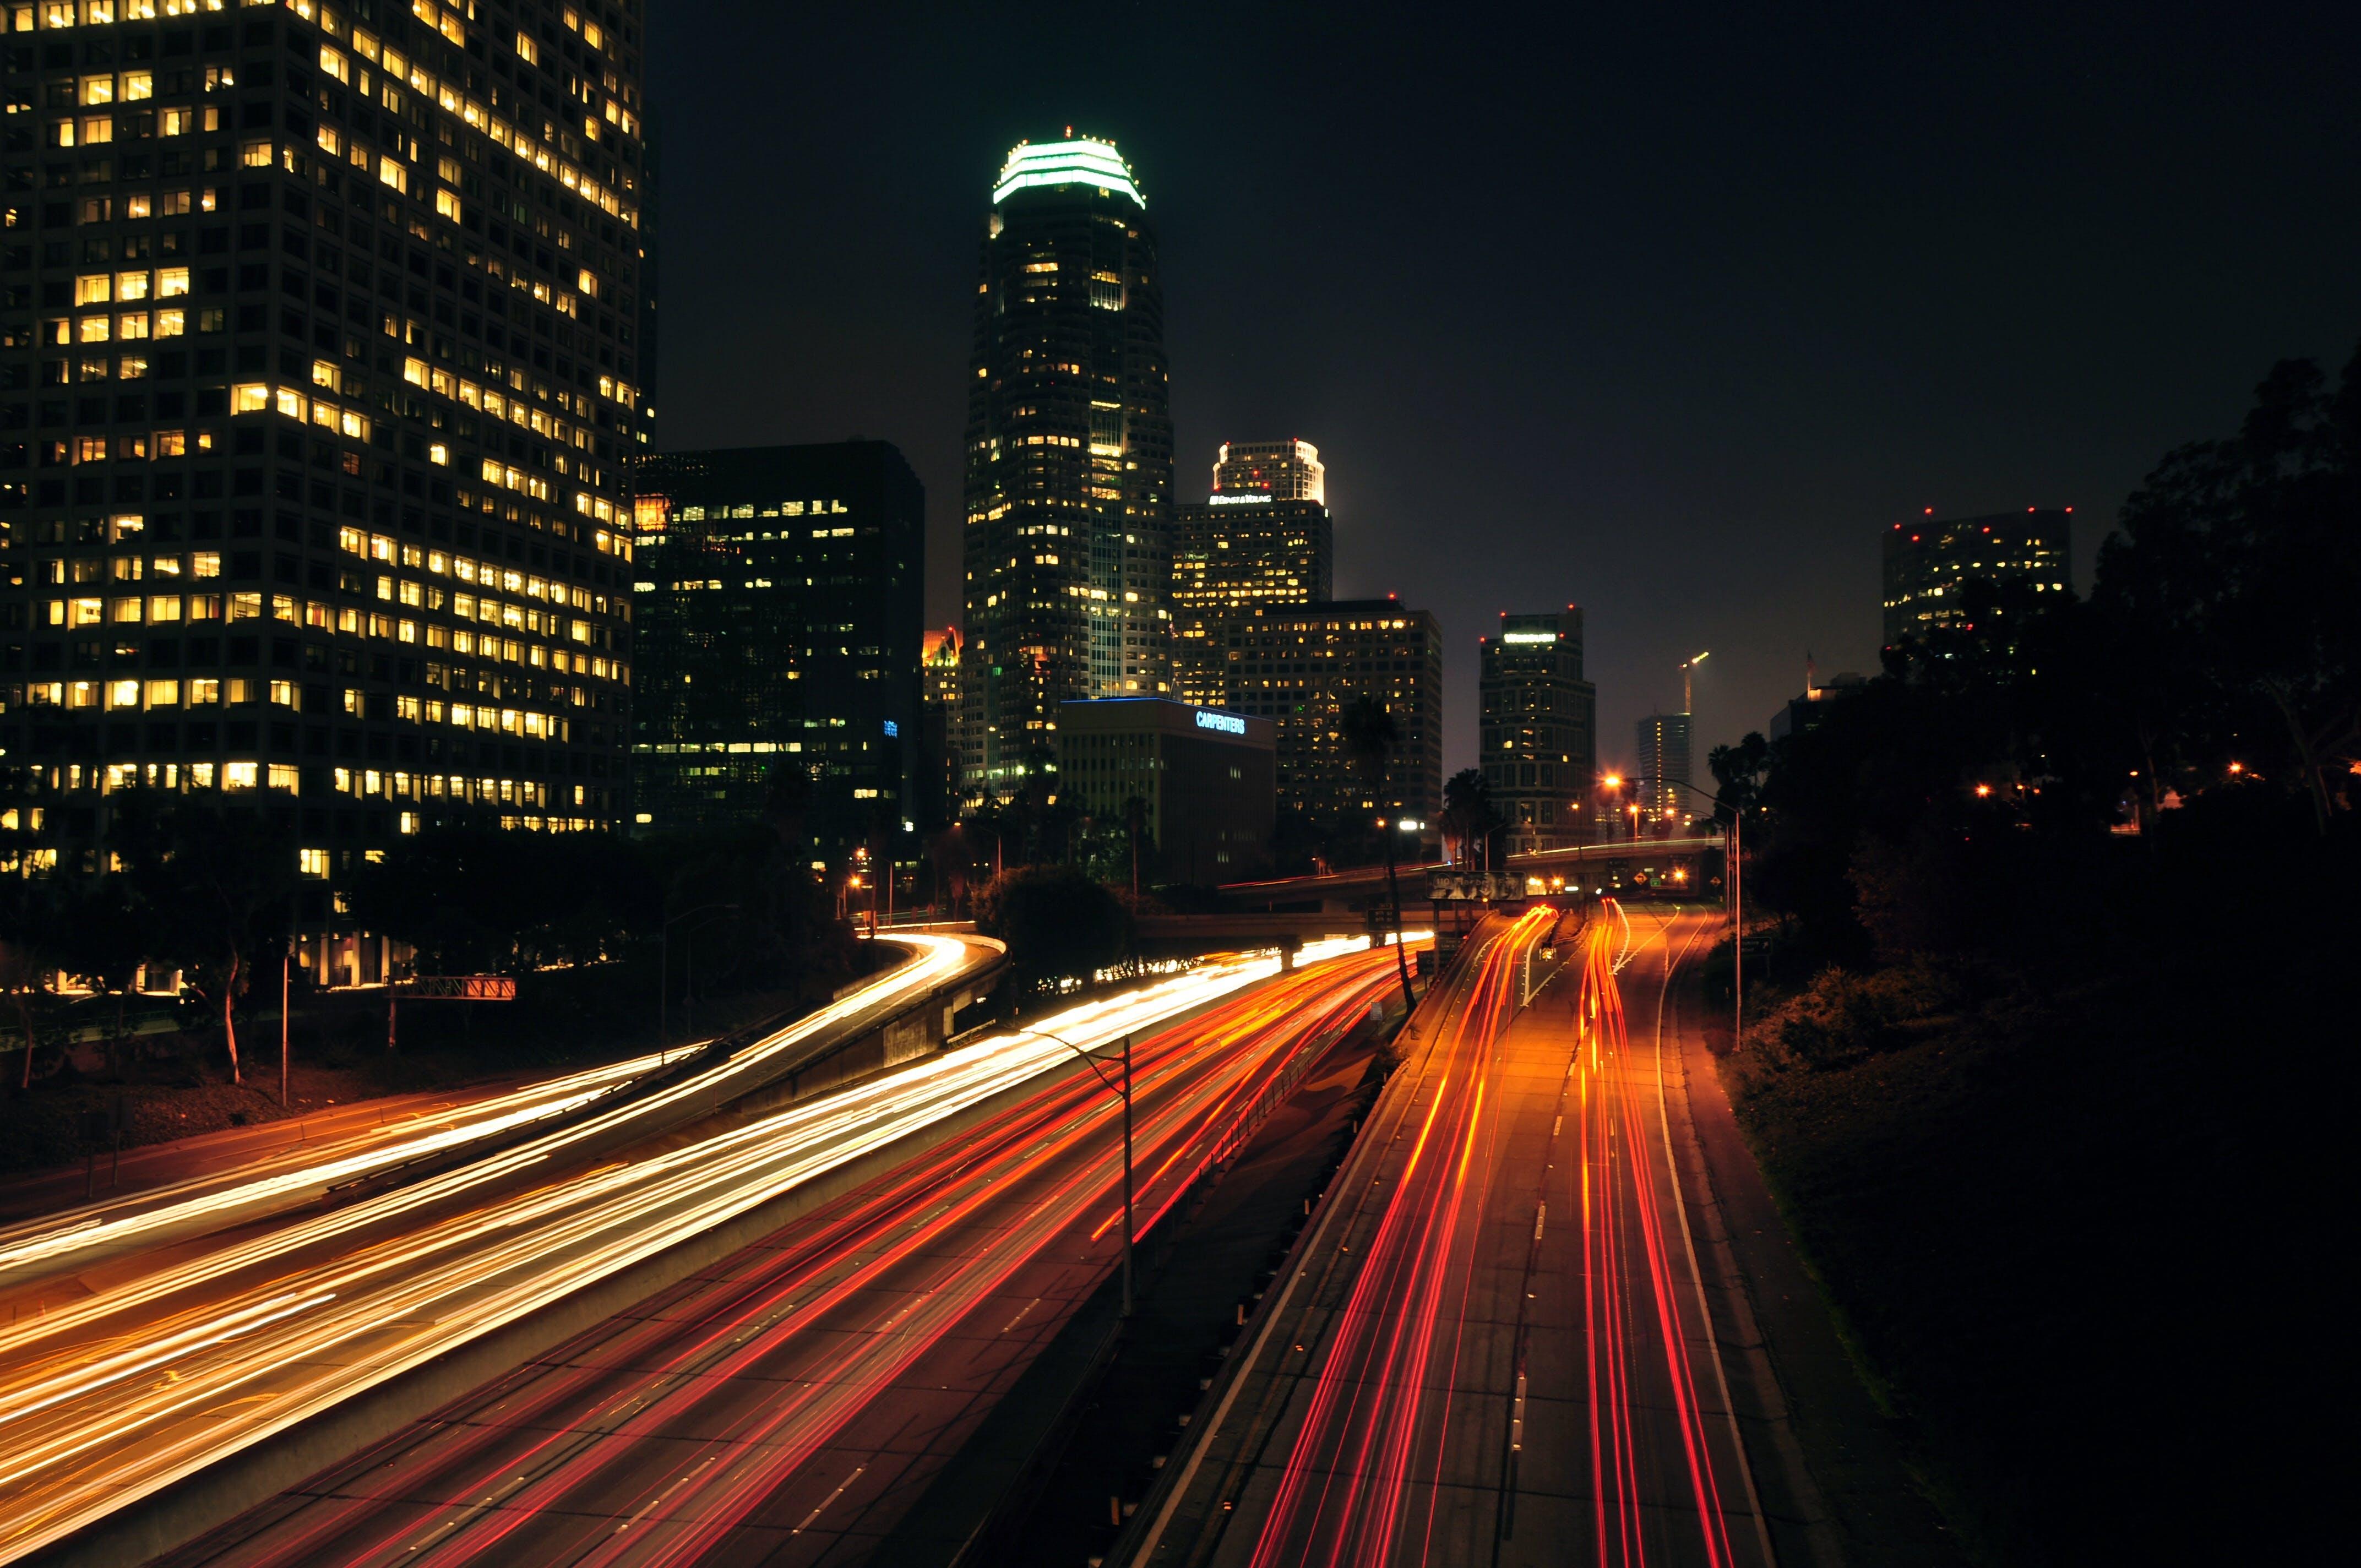 architecture, blur, bridge